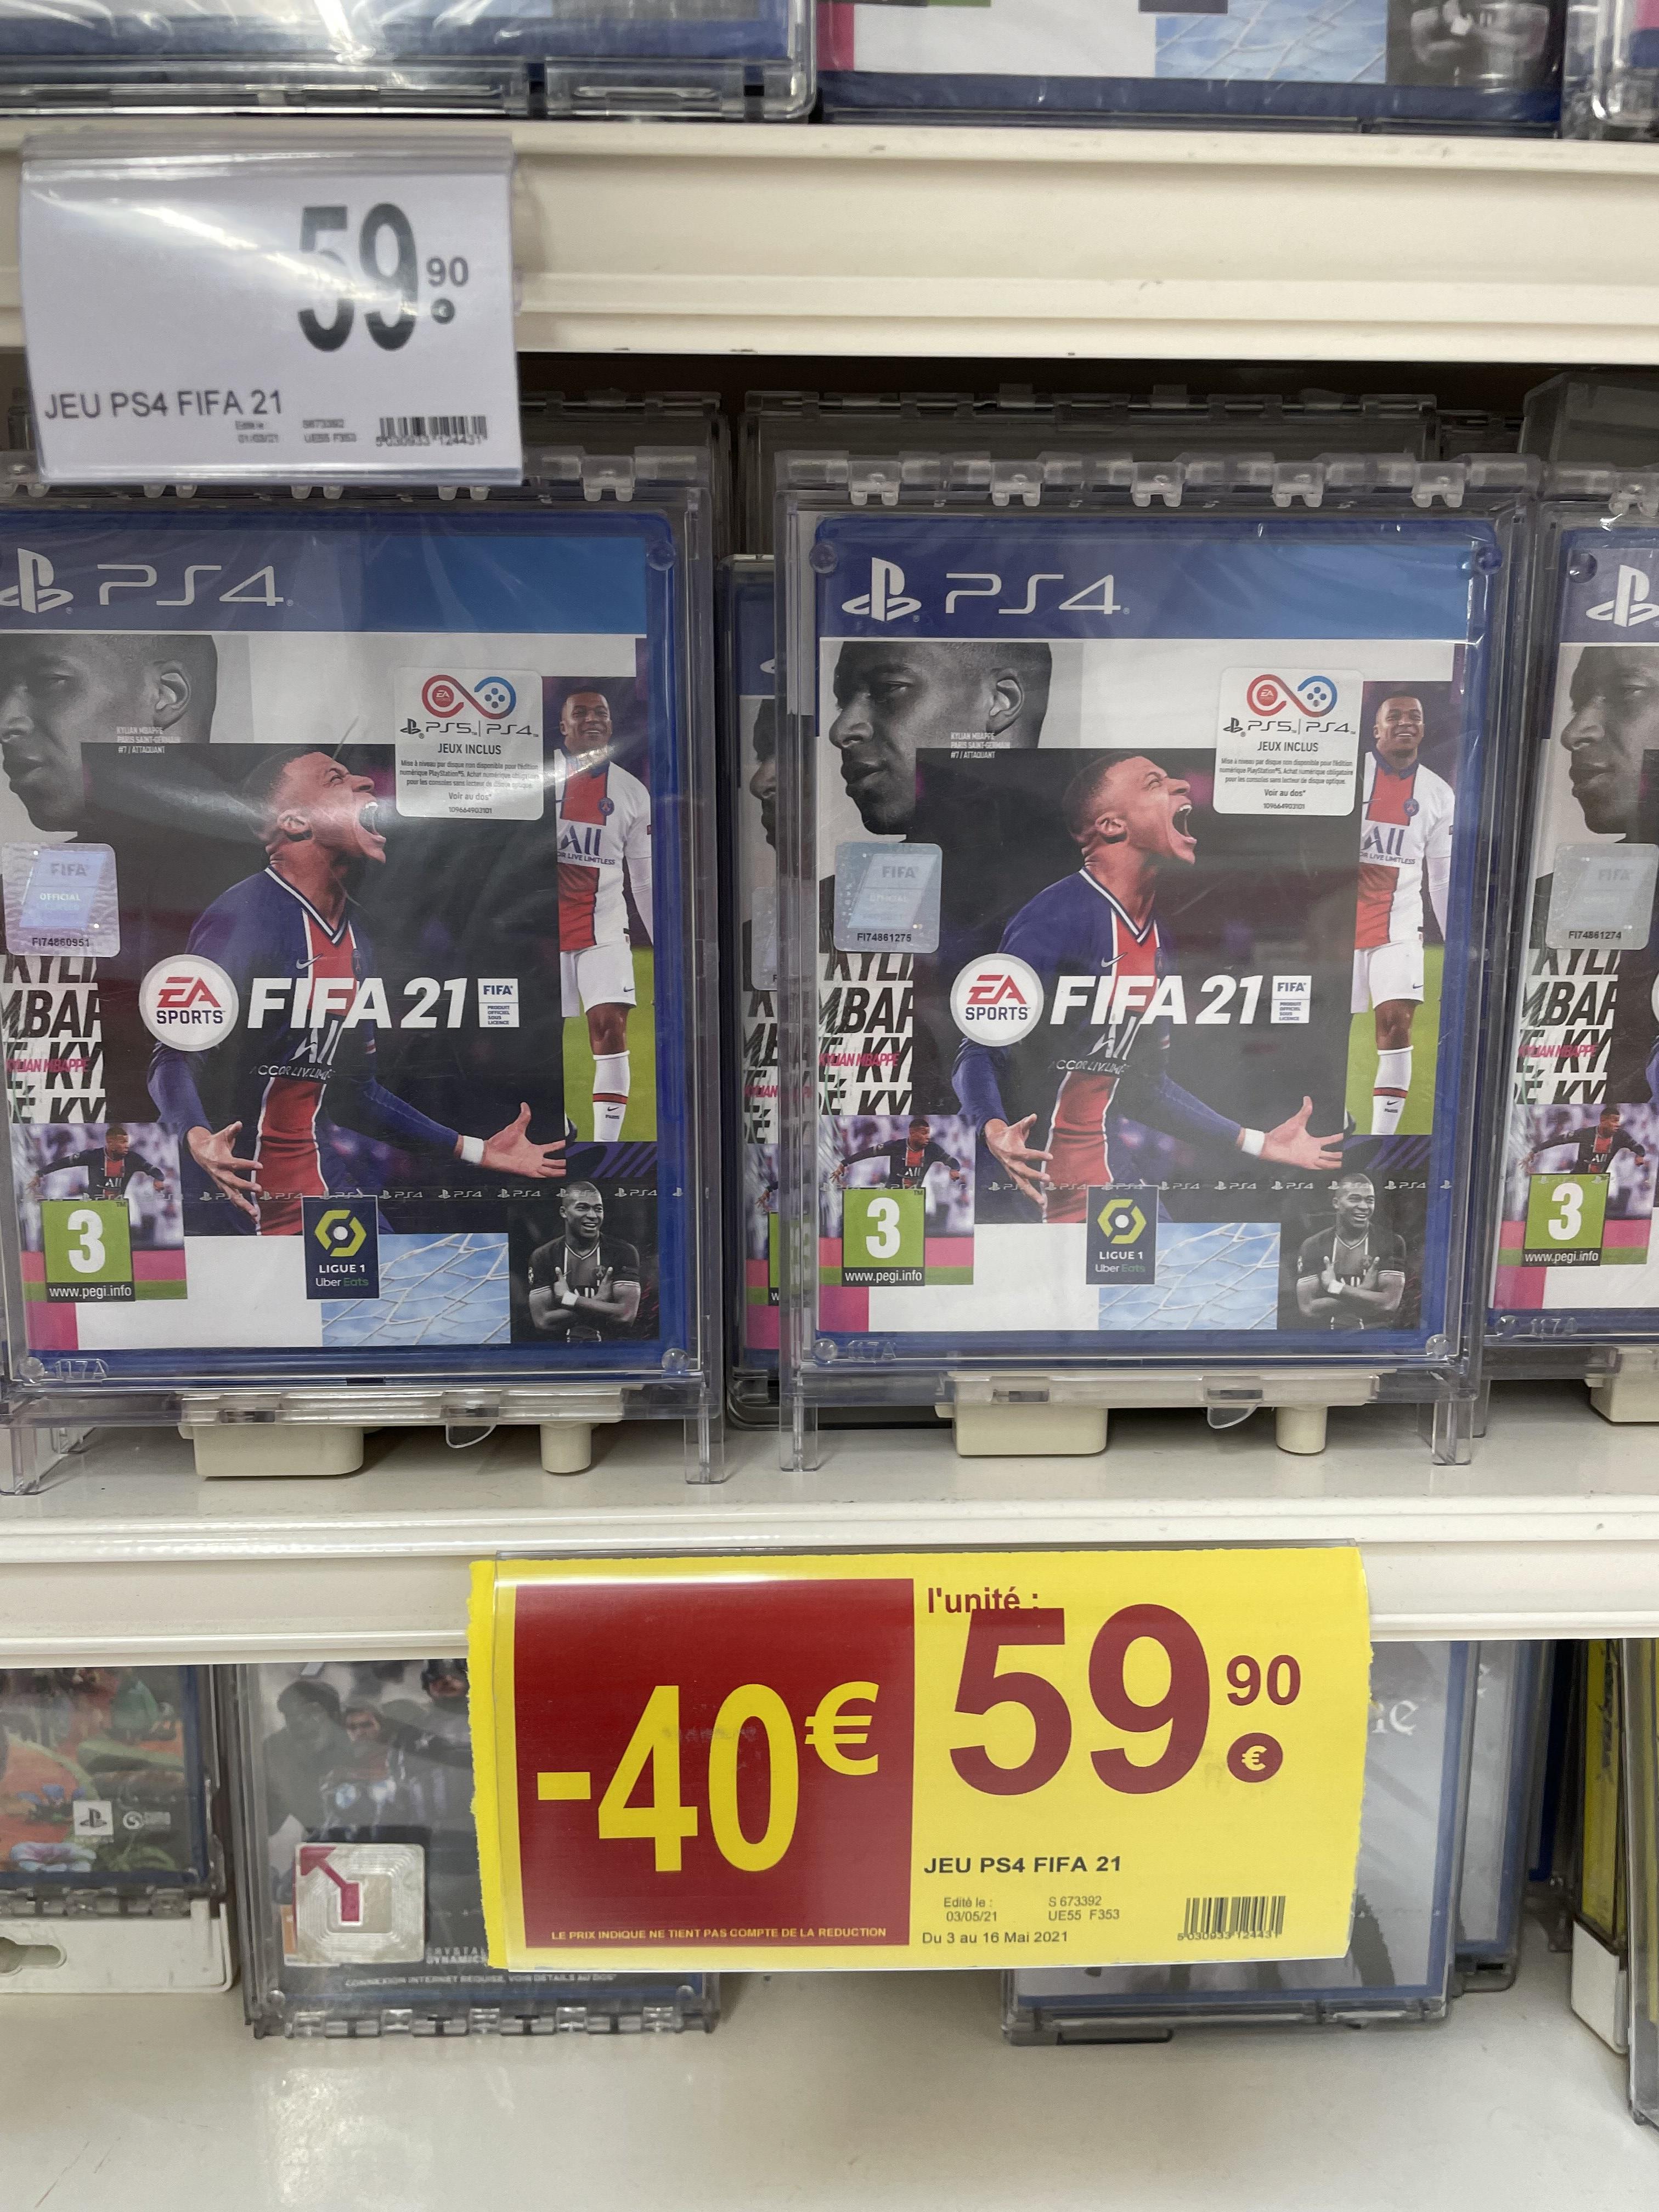 FIFA 21 sur PS4 et Xbox One (Niort 79).